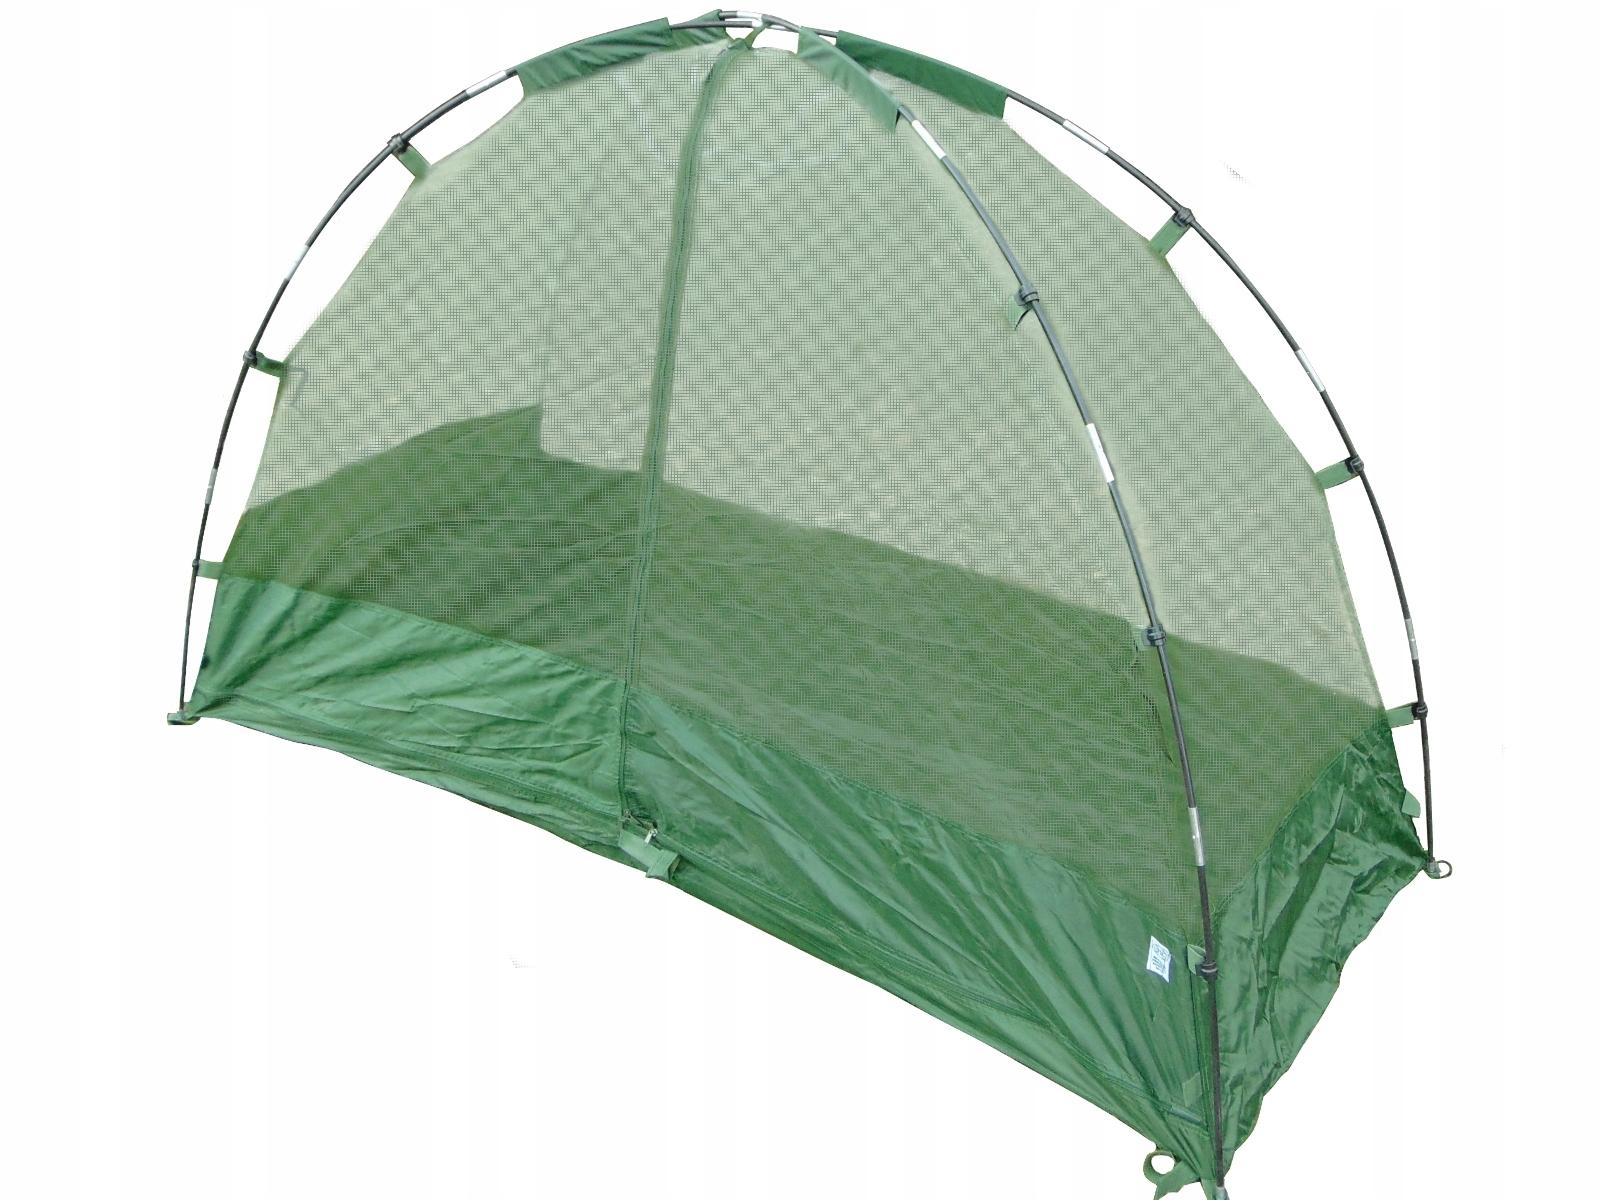 Mosquito net IGLU TYP stanu MFH